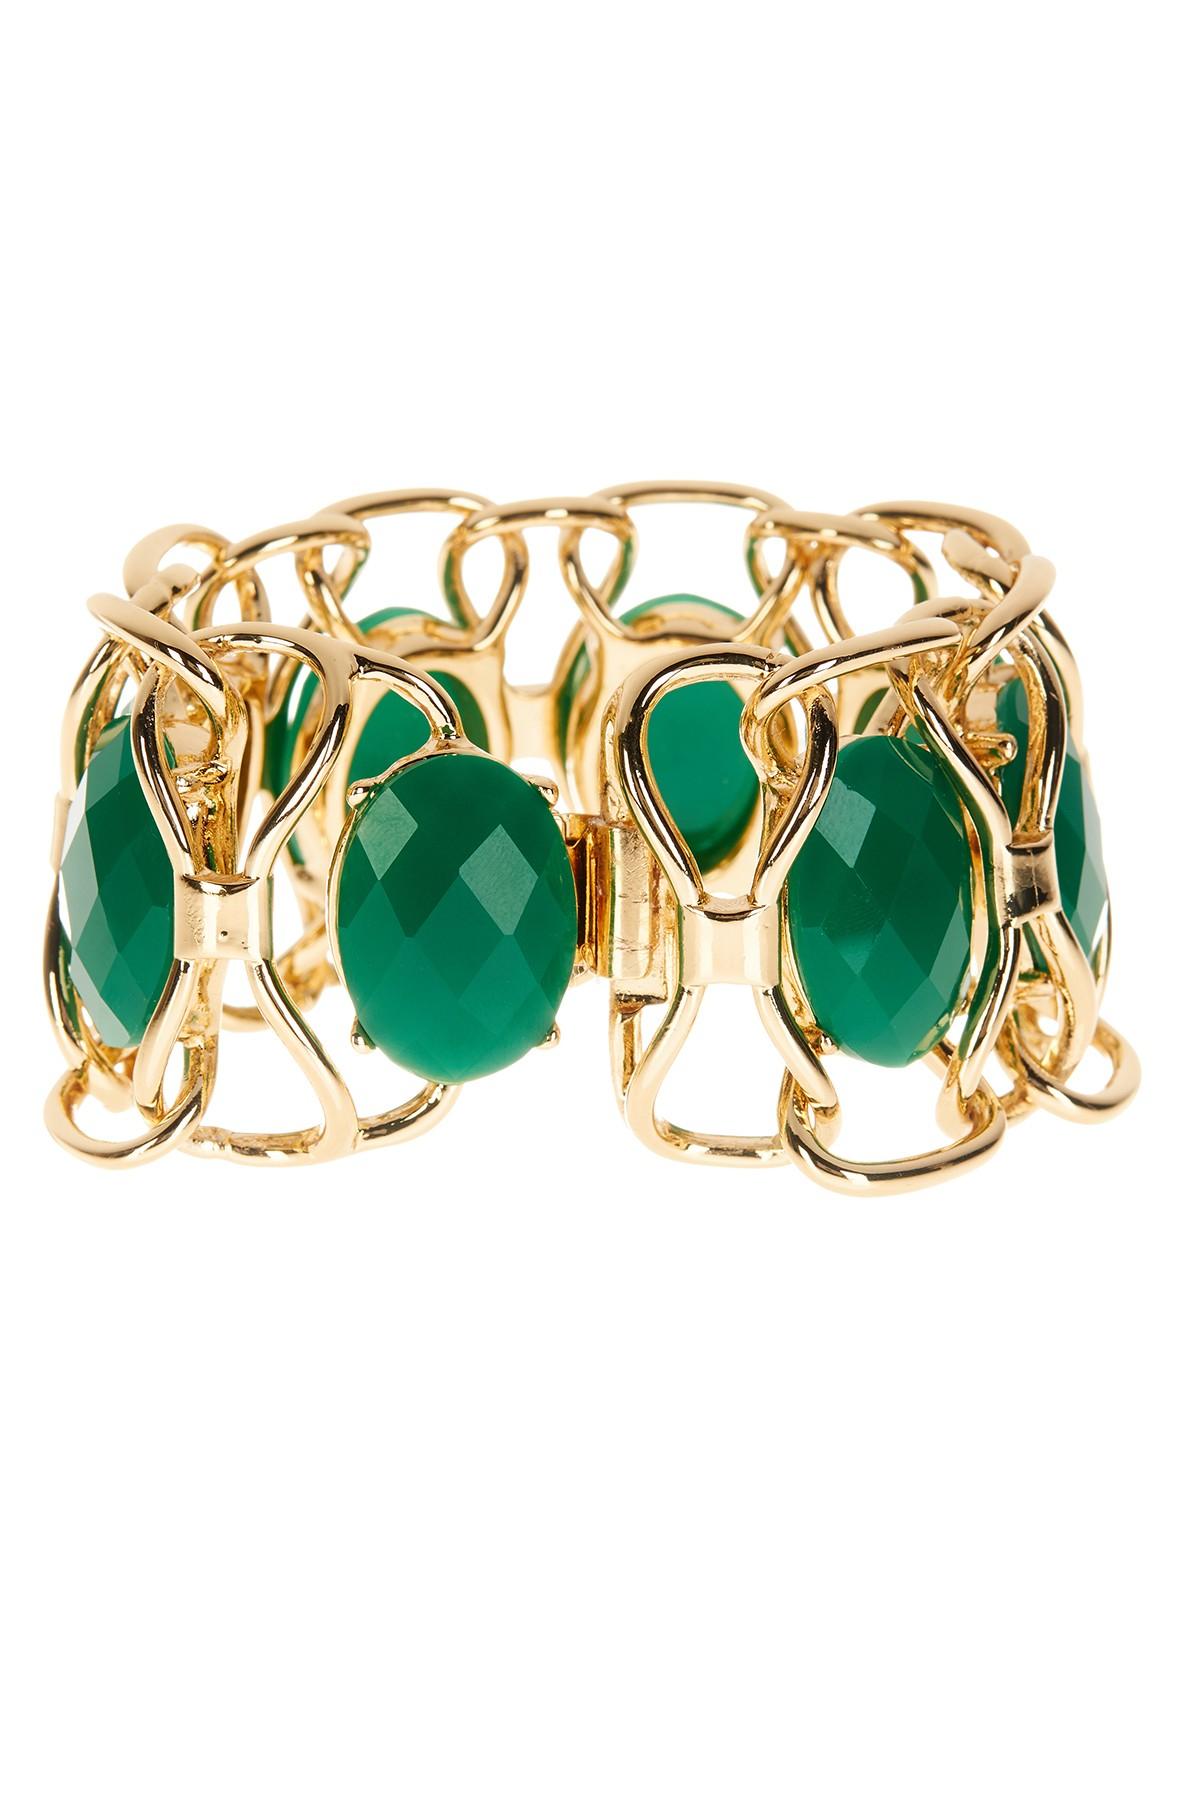 Nicole Miller Jewelry Box >> Lyst - Trina Turk Oval Stone Flex Bracelet in Green